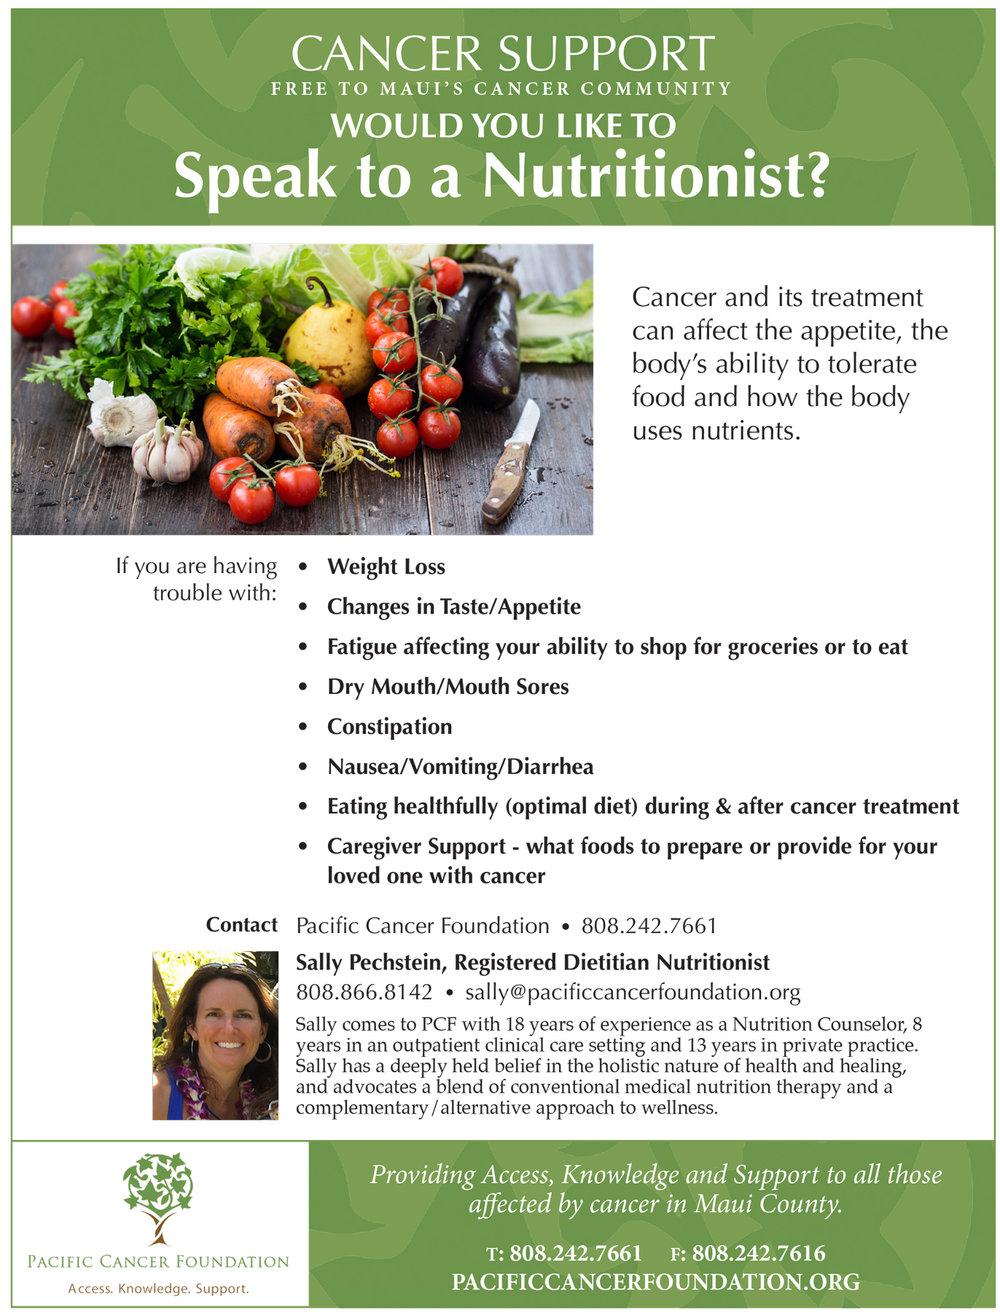 Nutritional-Support-flyer.jpg